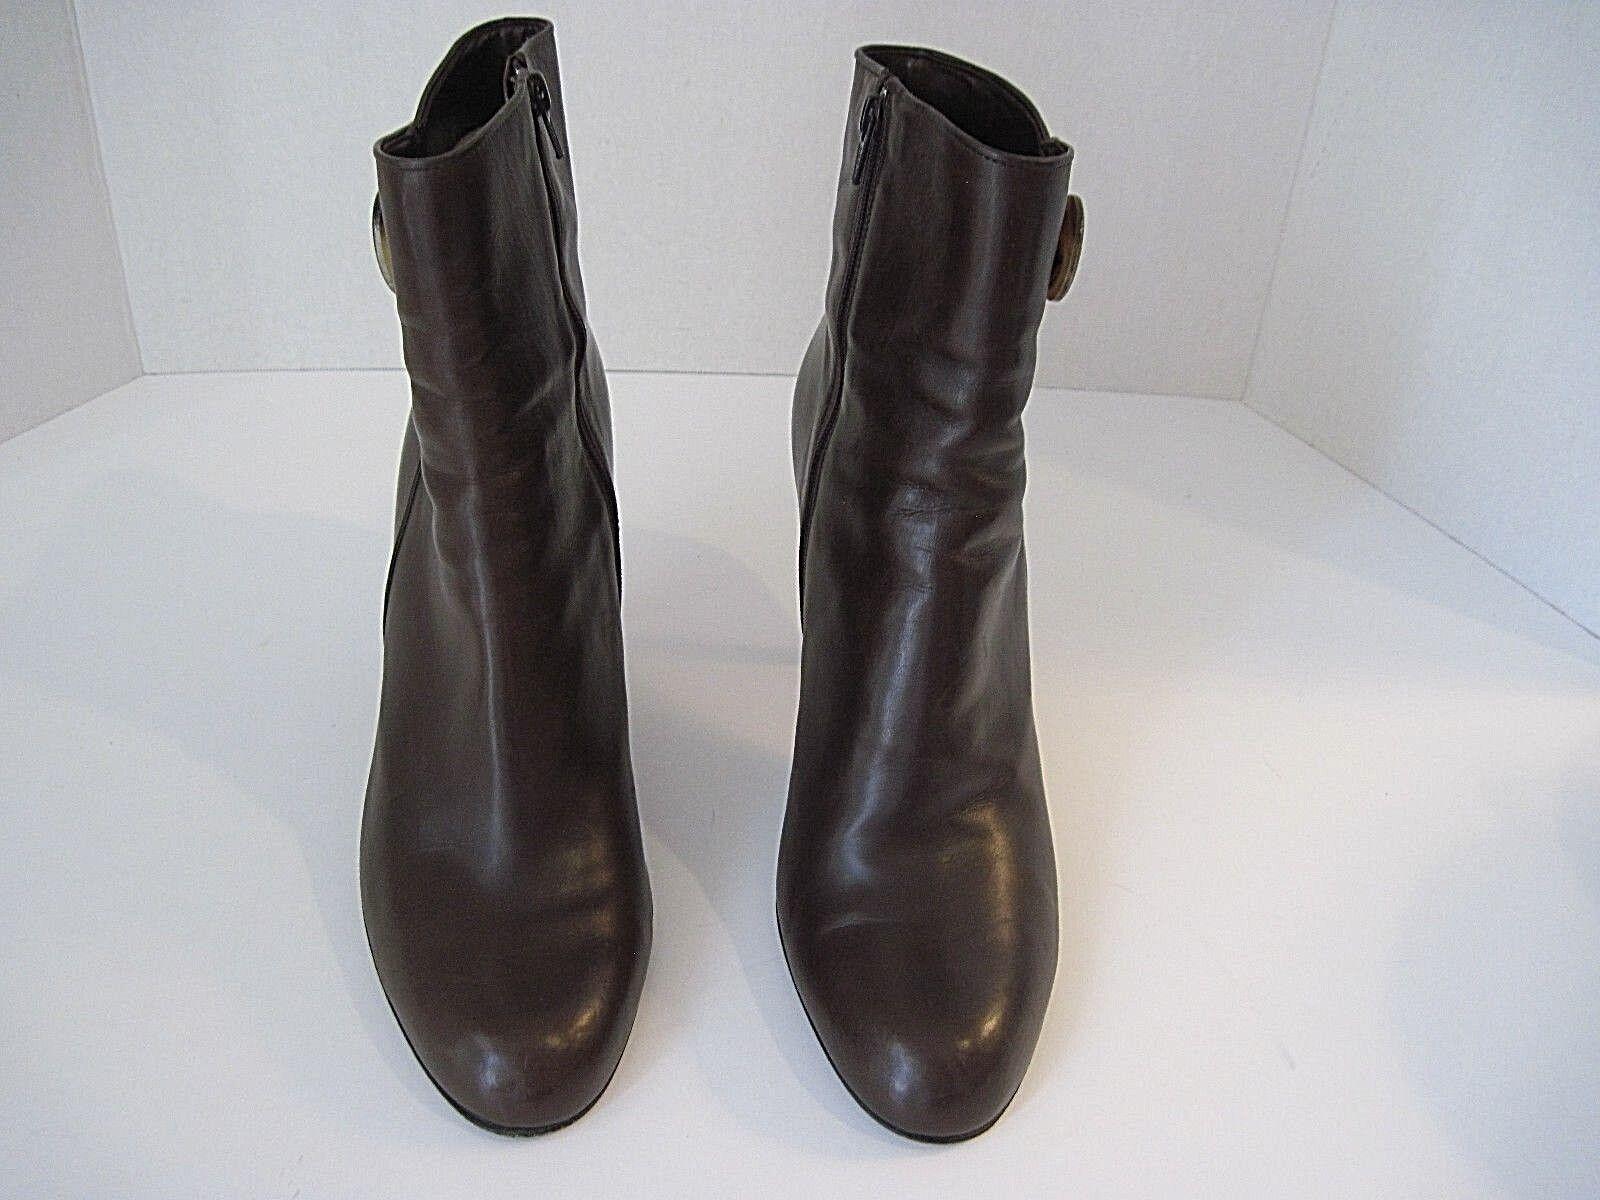 MICHEL PERRY (ITALY) Gorgeous Braun Leder Ankle Ankle Ankle Stiefel Größe Zip Größe 40 6dc619